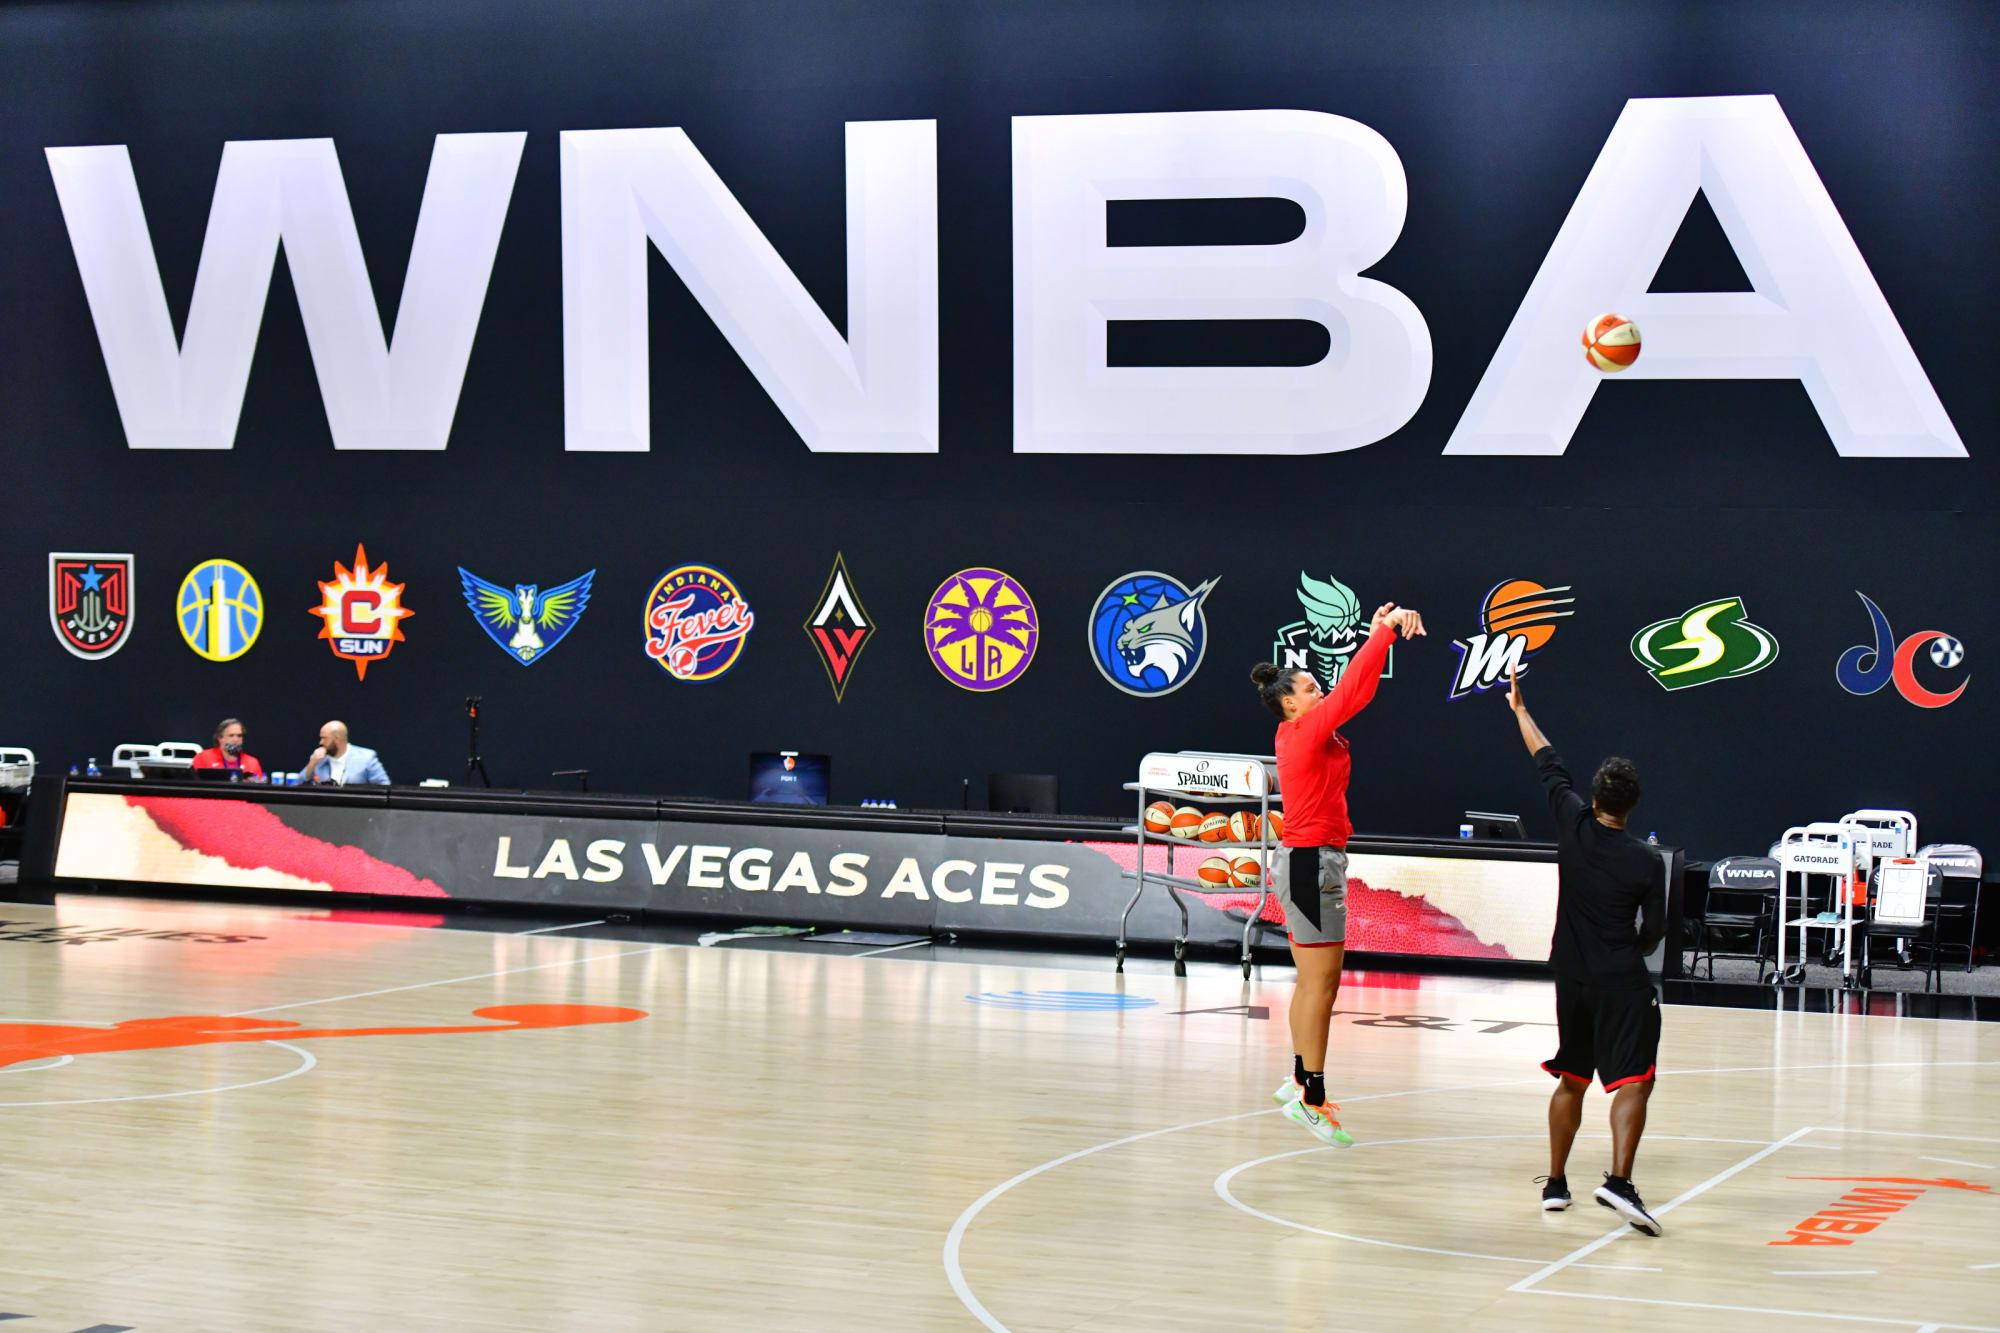 Could the Raptors help create a Toronto WNBA team?